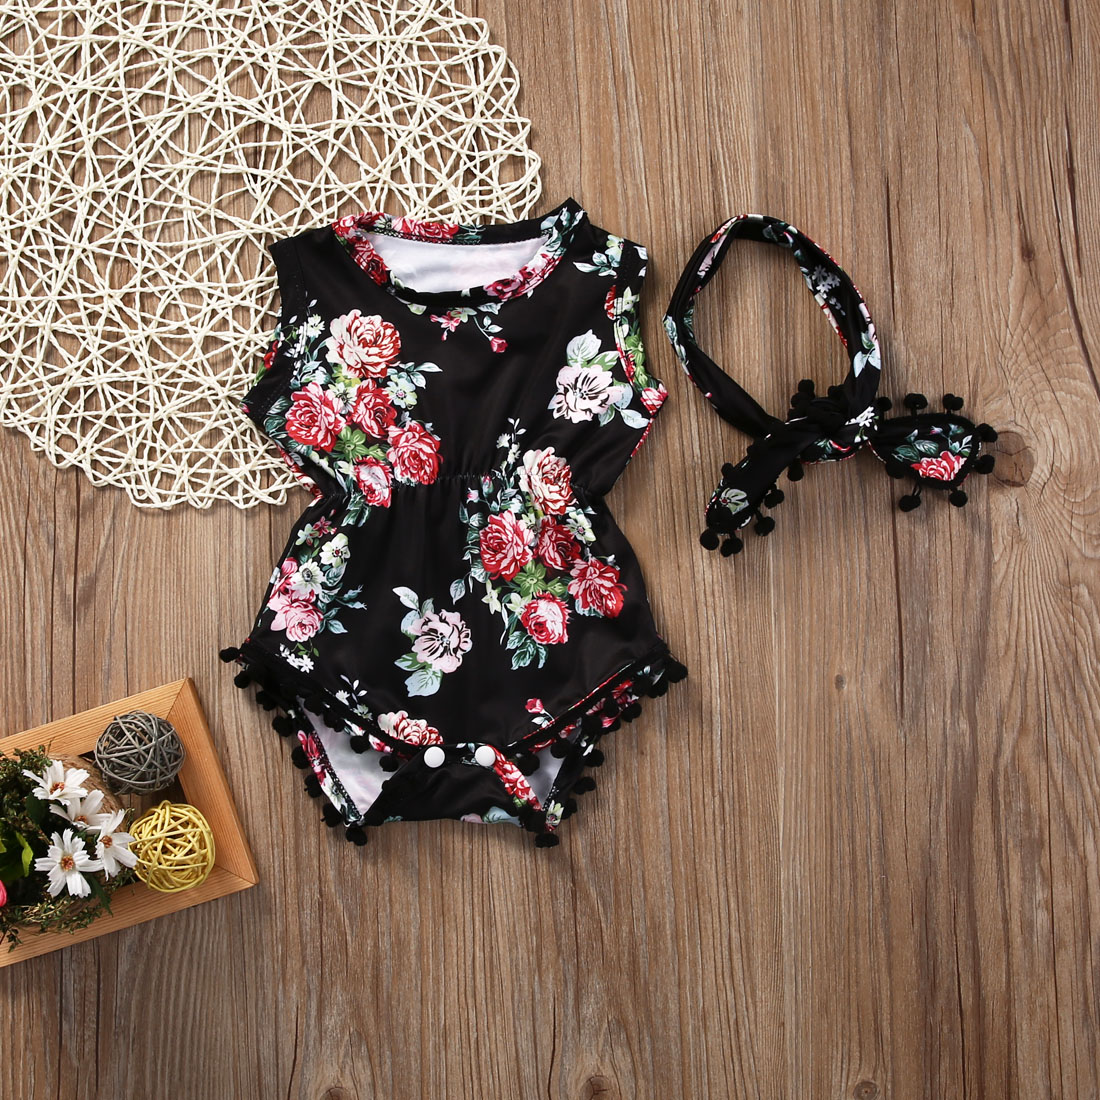 Summer-Baby-Girl-Romper-2017-Summer-Floral-Tassel-Bodysuit-Jumpsuit-Headband-2PCS-Outfit-Sunsuit-Tracksuit-Clothing-Set-2